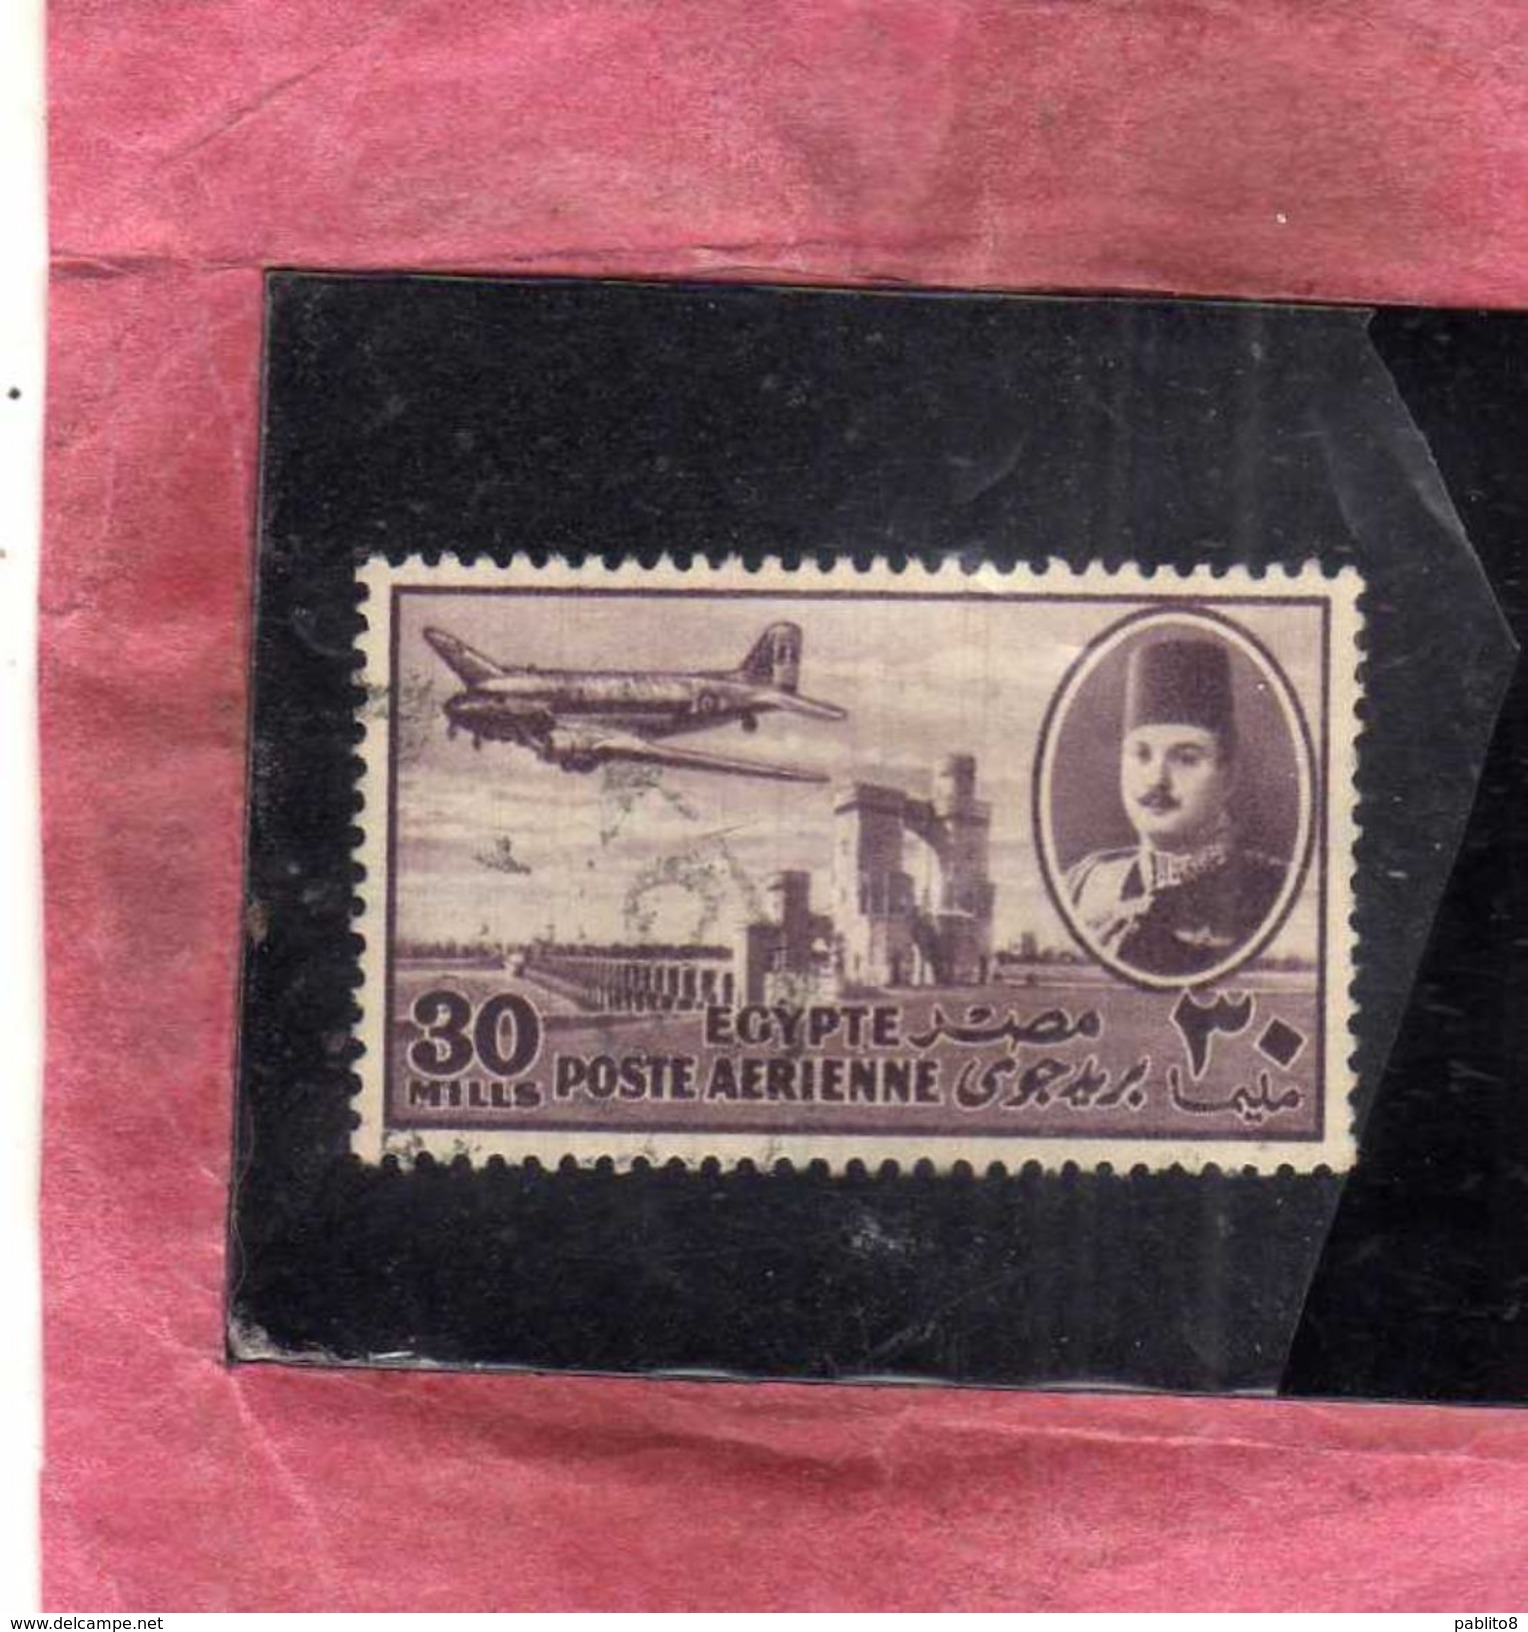 EGYPT EGITTO 1947 AIR MAIL POSTA AEREA KING FAROUK DELTA DAM DC-3 PLANE 30m USATO USED OBLITERE' - Posta Aerea